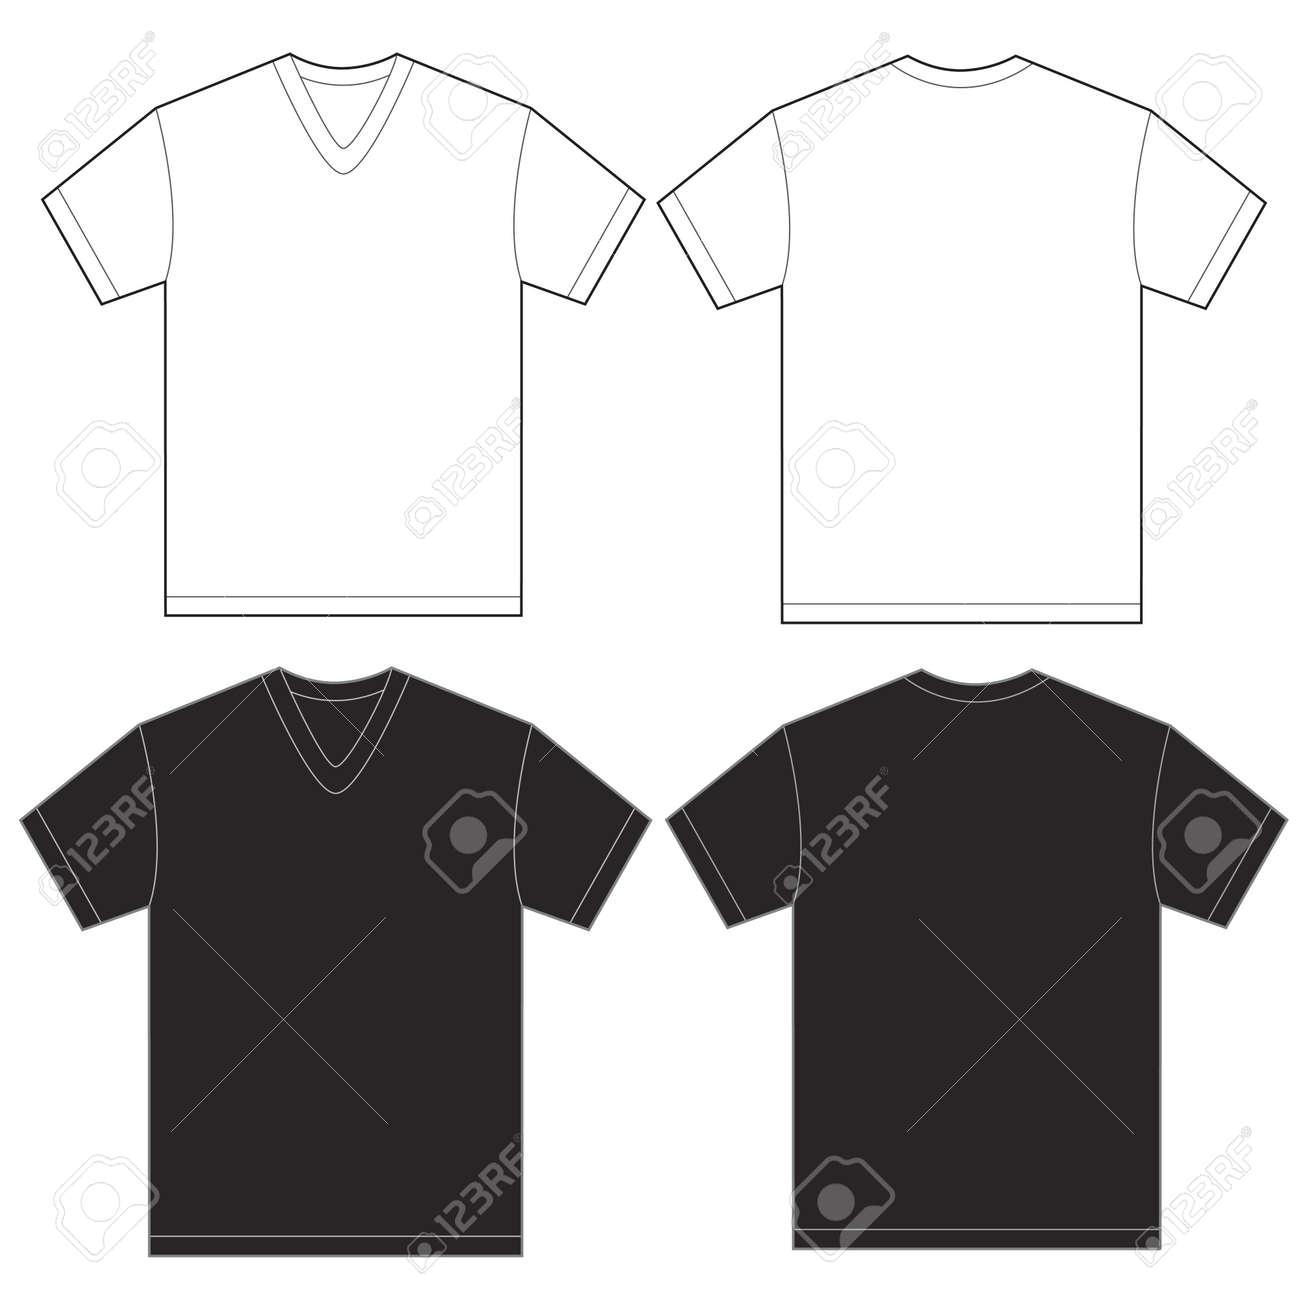 Vector Illustration Of Black And White V-neck Shirt, Isolated ...